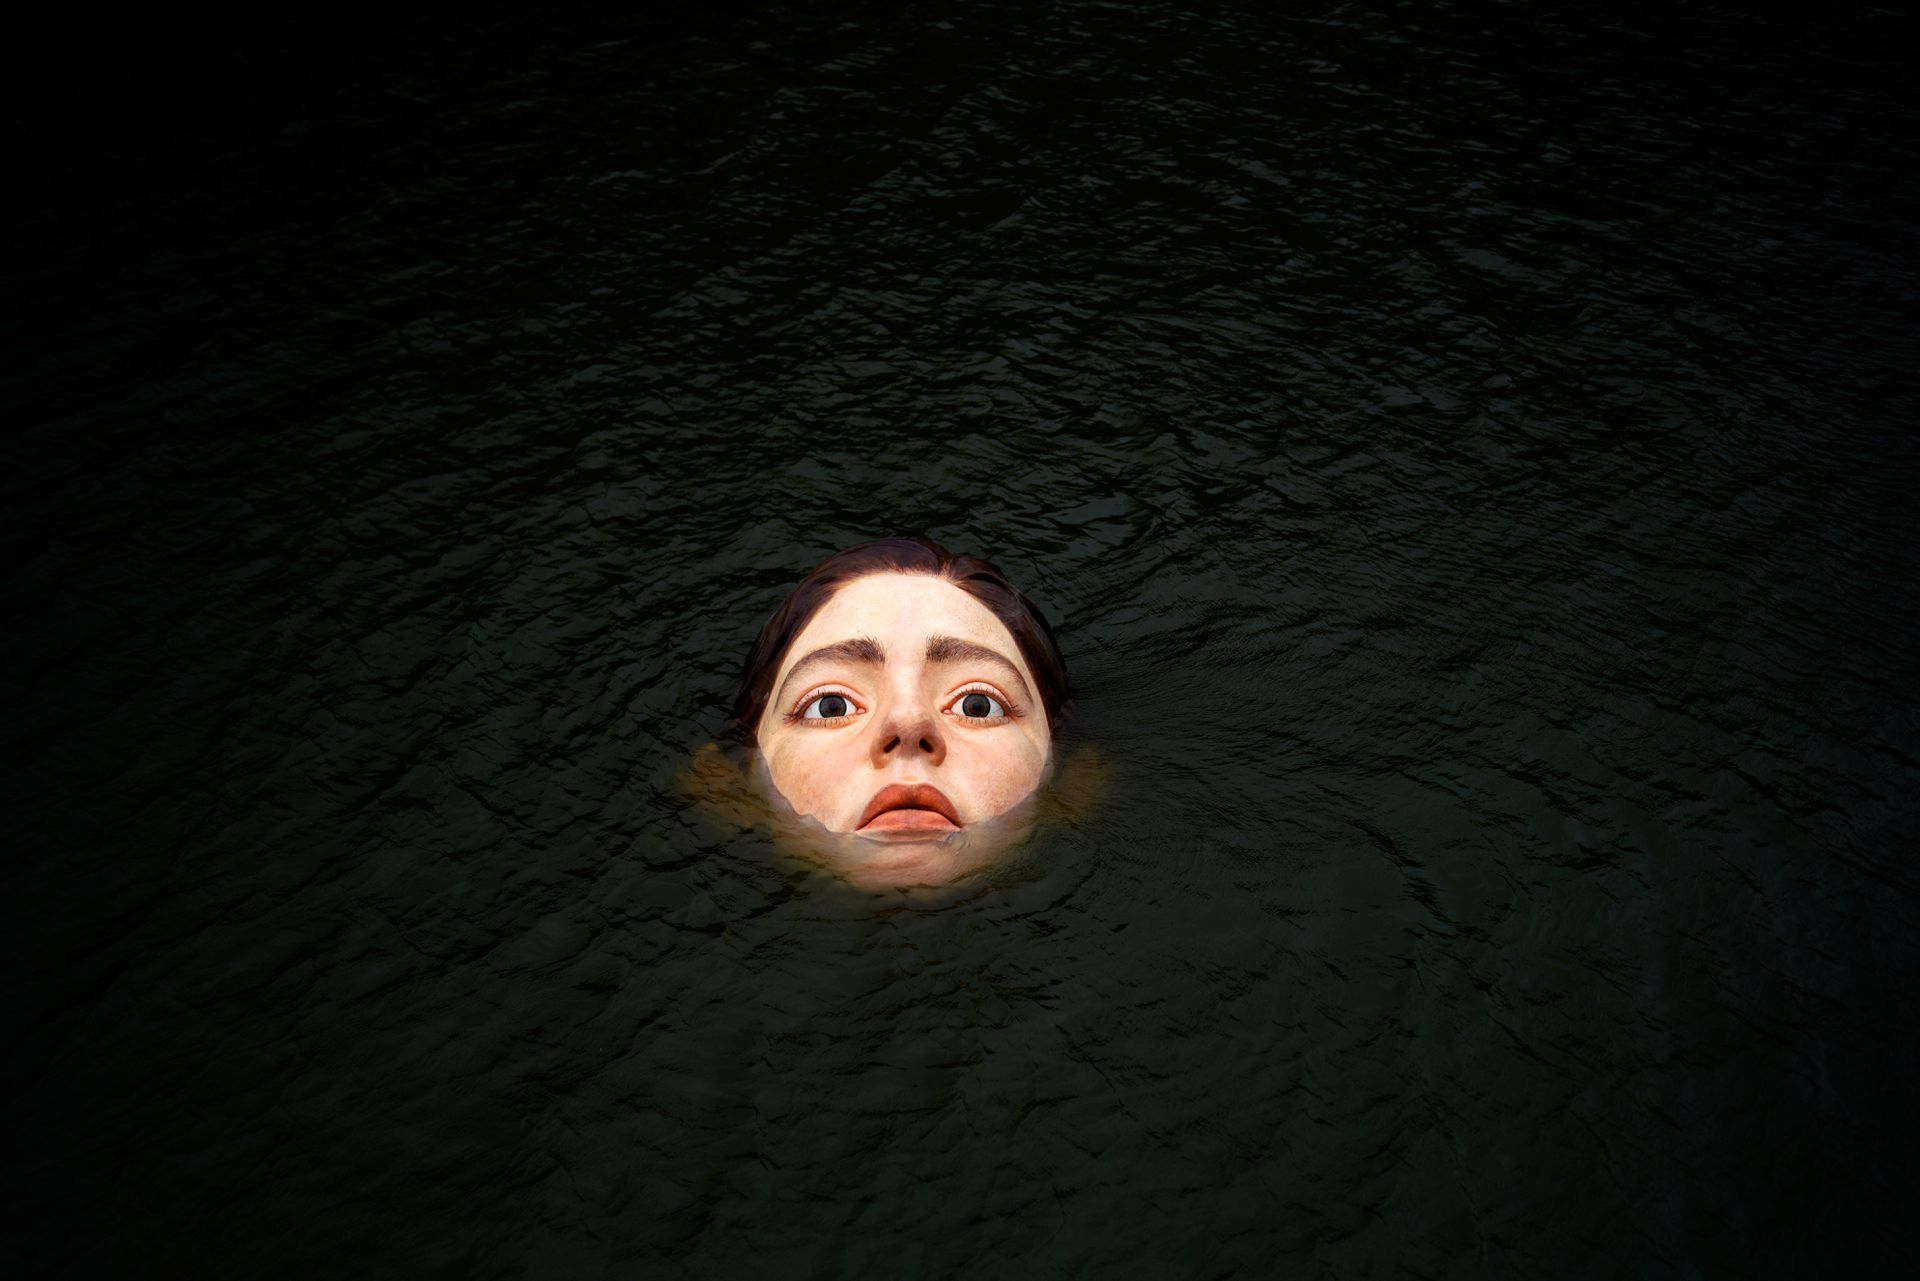 Снимок дня. Скульптура тонущей девочки в Испании